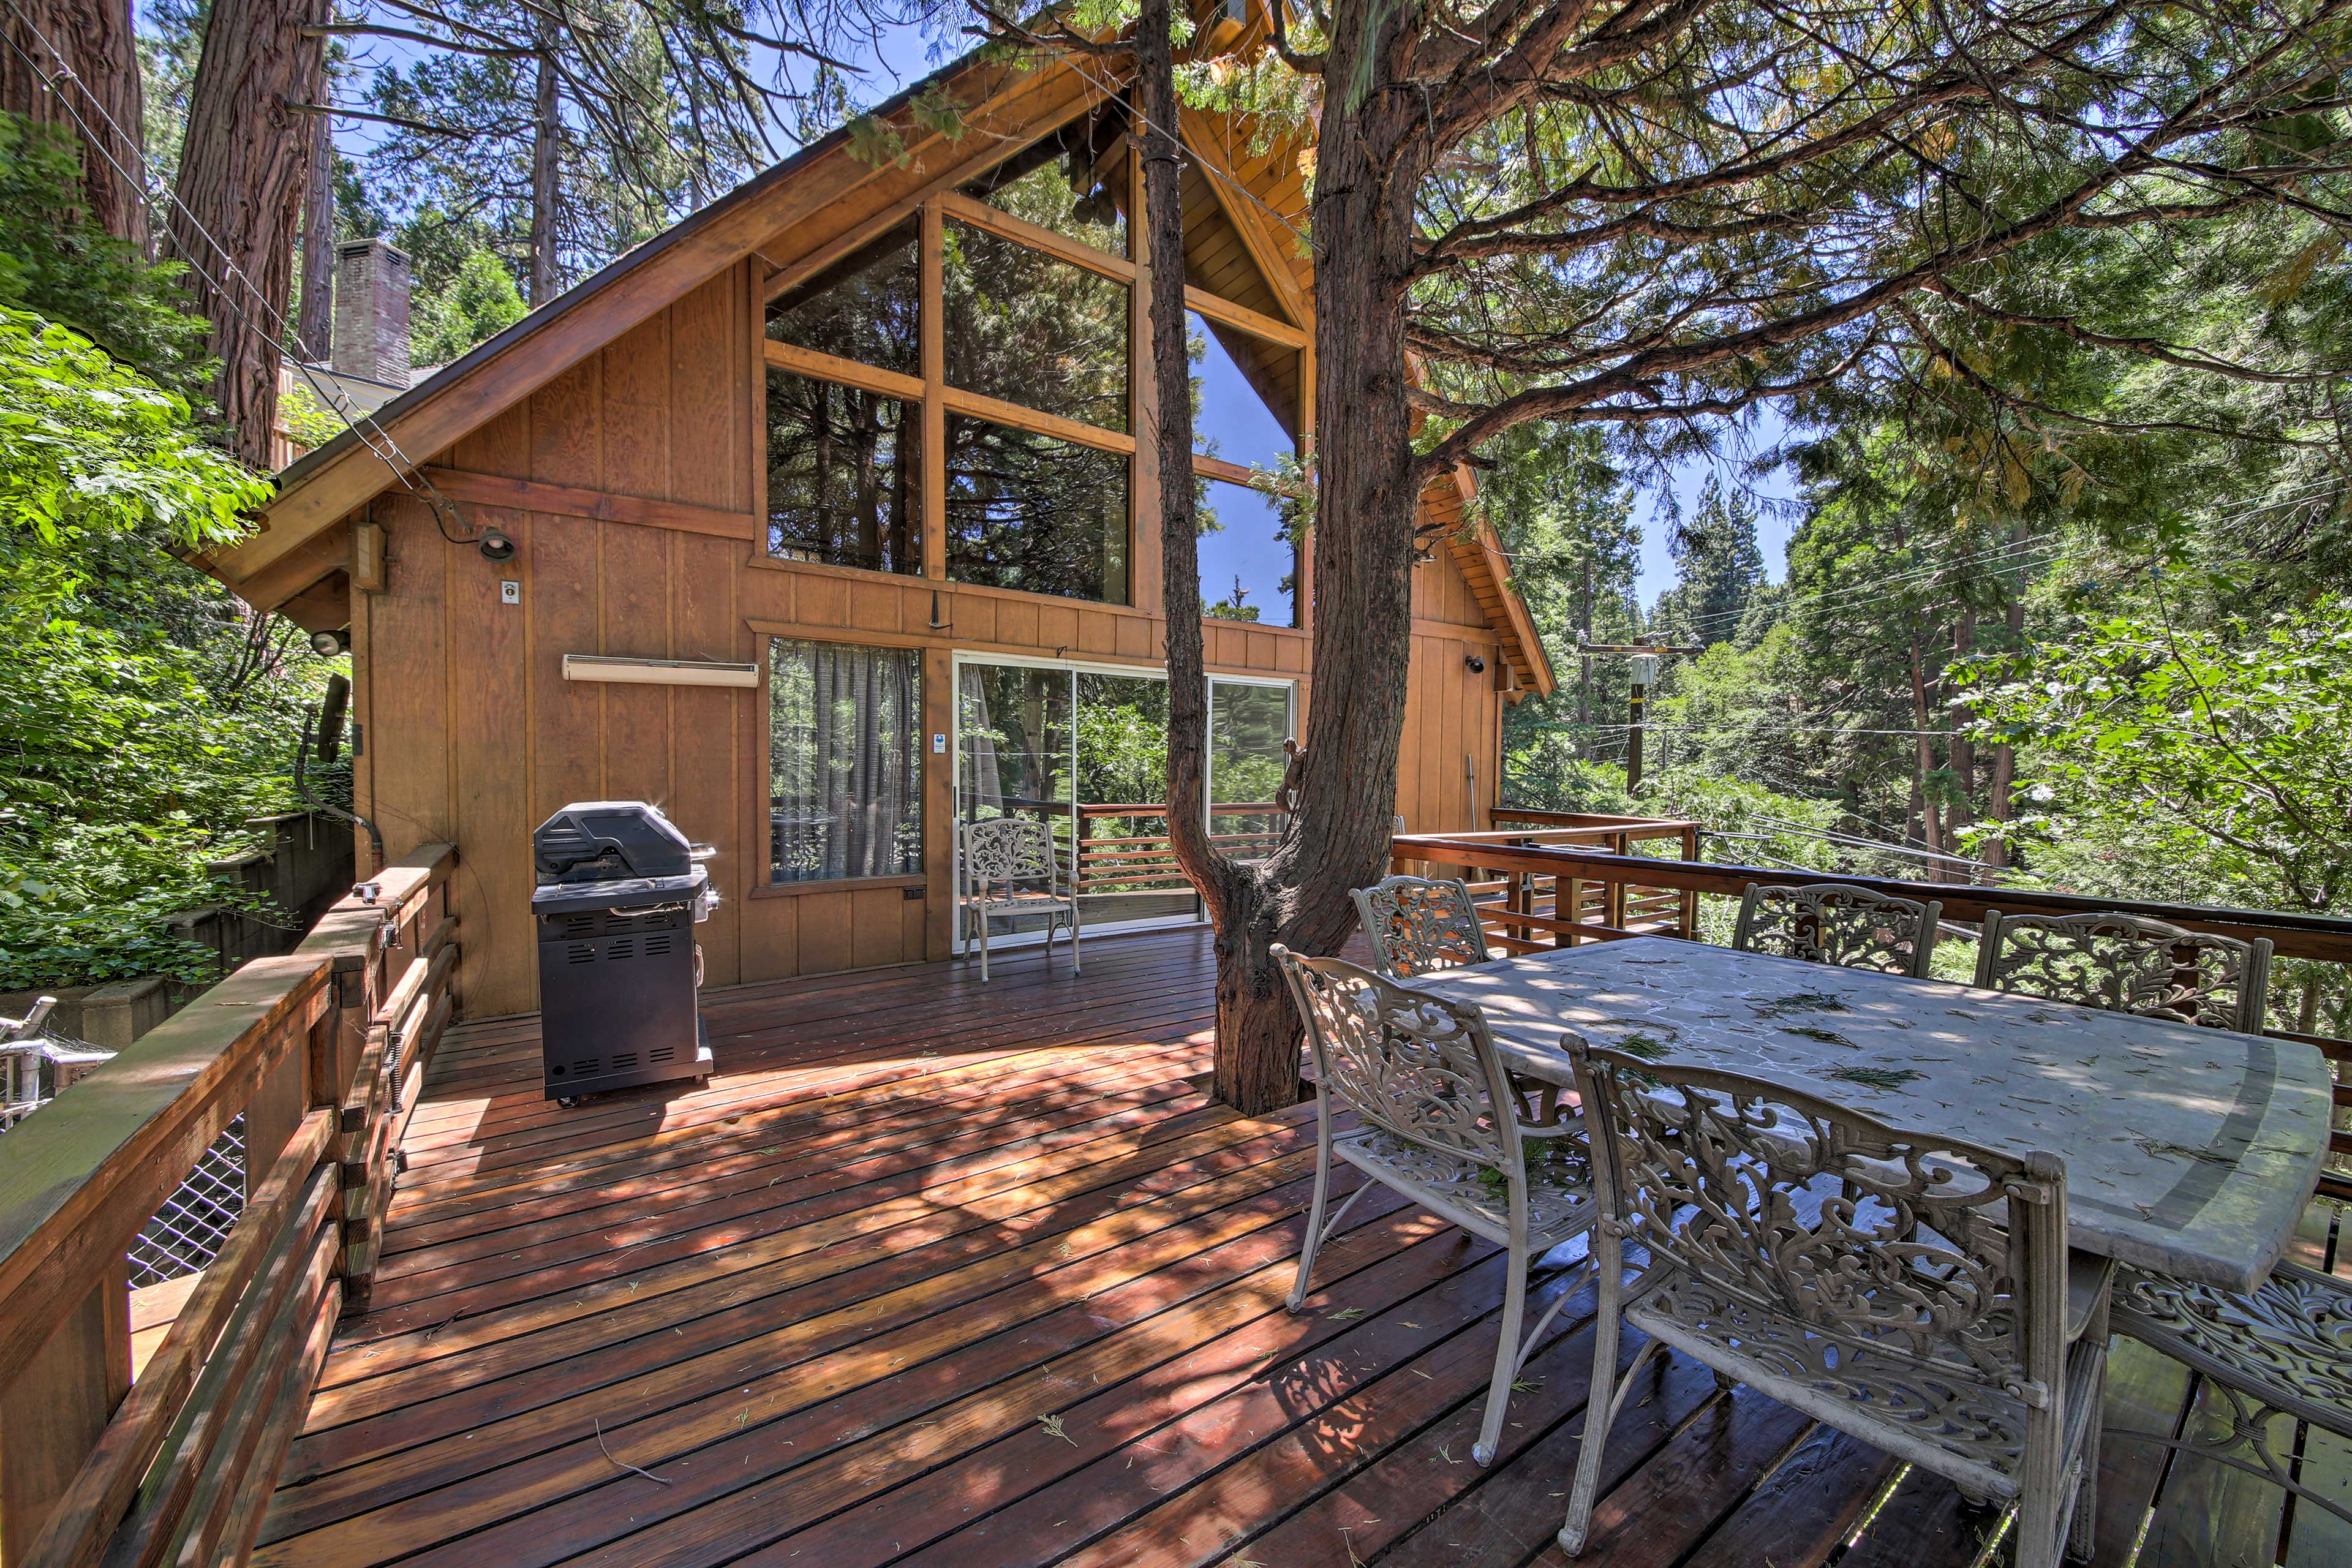 Lake Arrowhead Vacation Rental House   2BR   2BA   1,800 Sq Ft   6 Guests